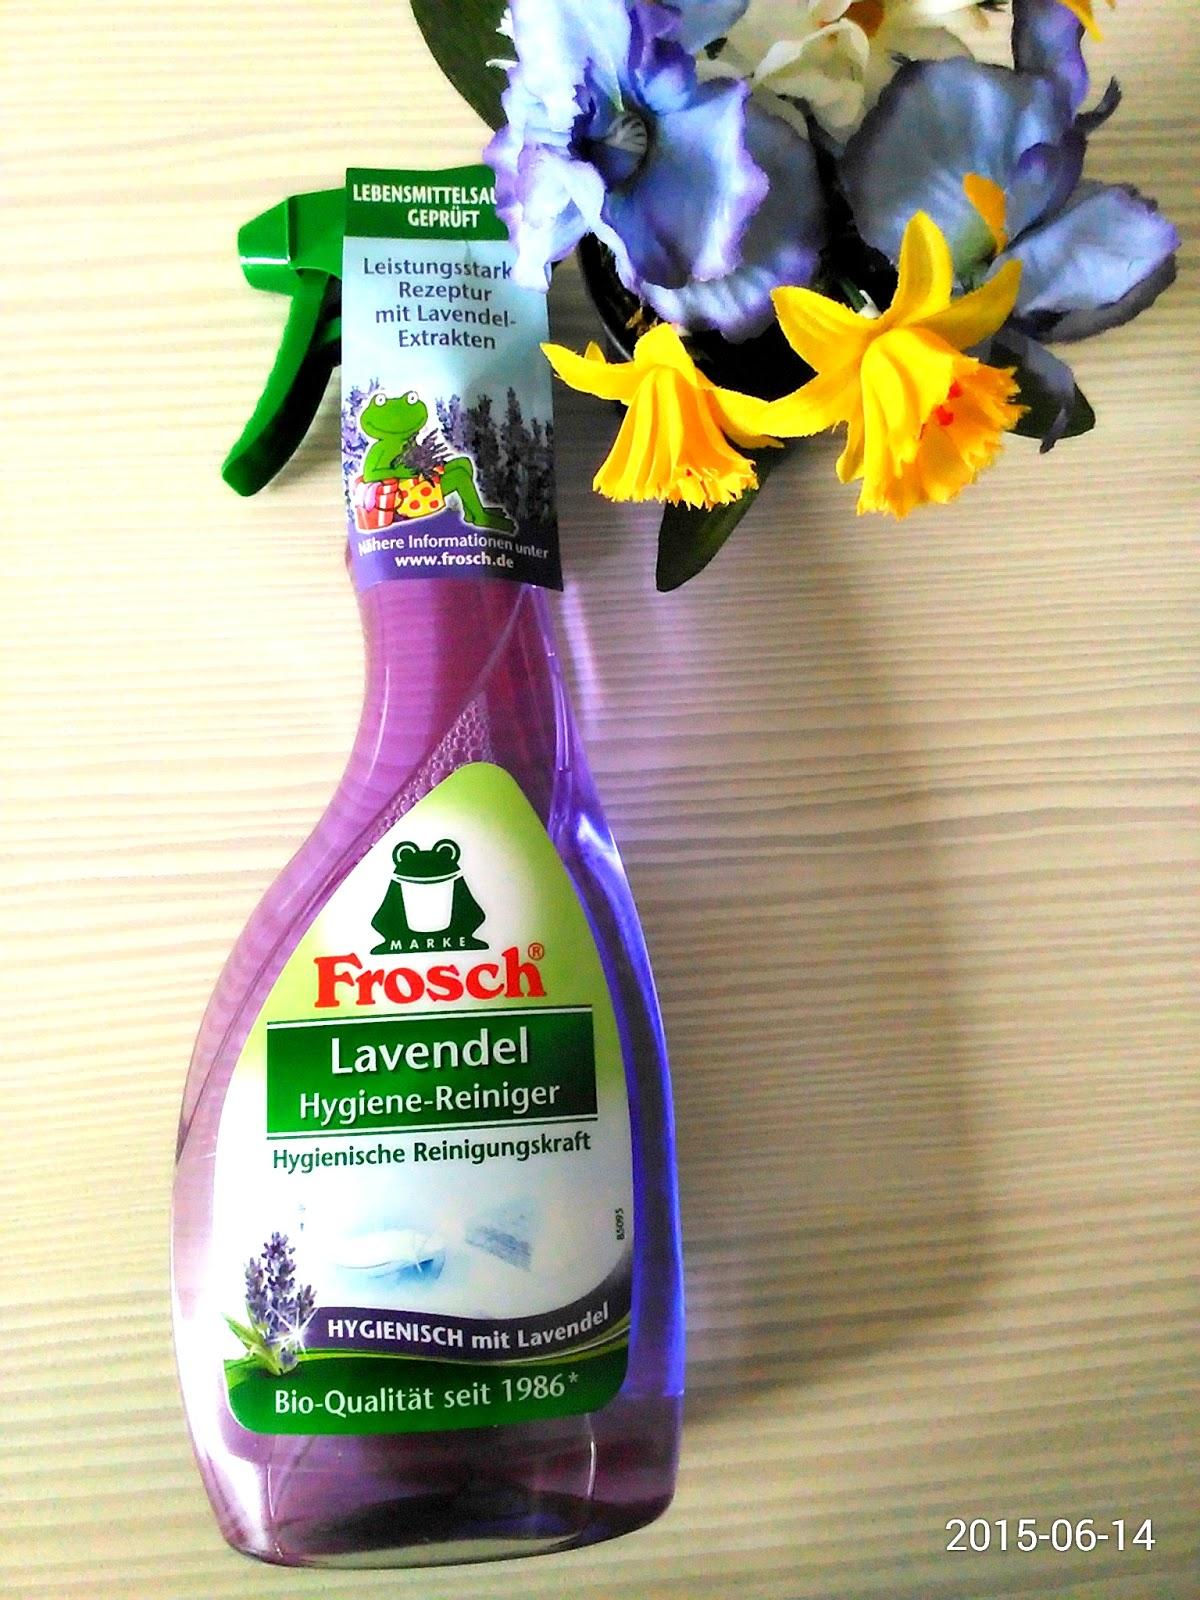 irinastestwelt frosch lavendel hygiene reiniger. Black Bedroom Furniture Sets. Home Design Ideas